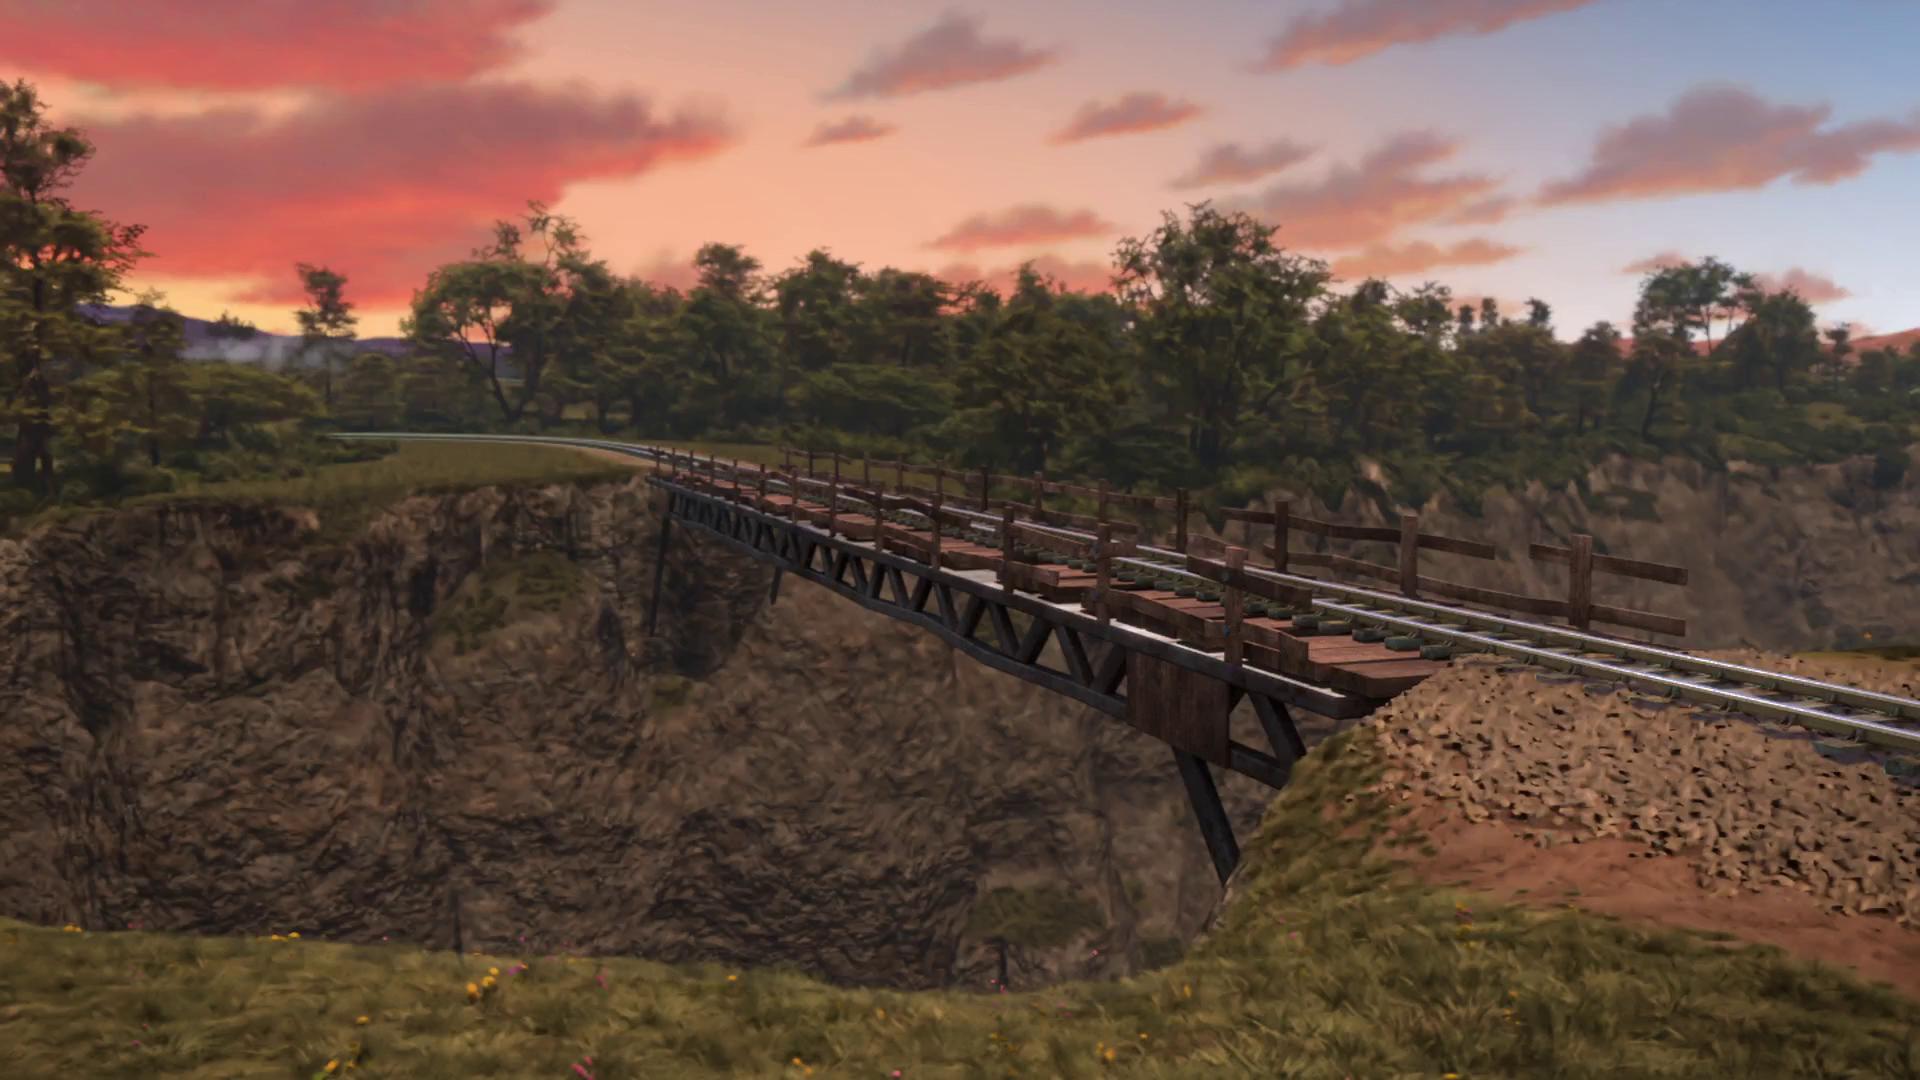 The Rickety Old Bridge